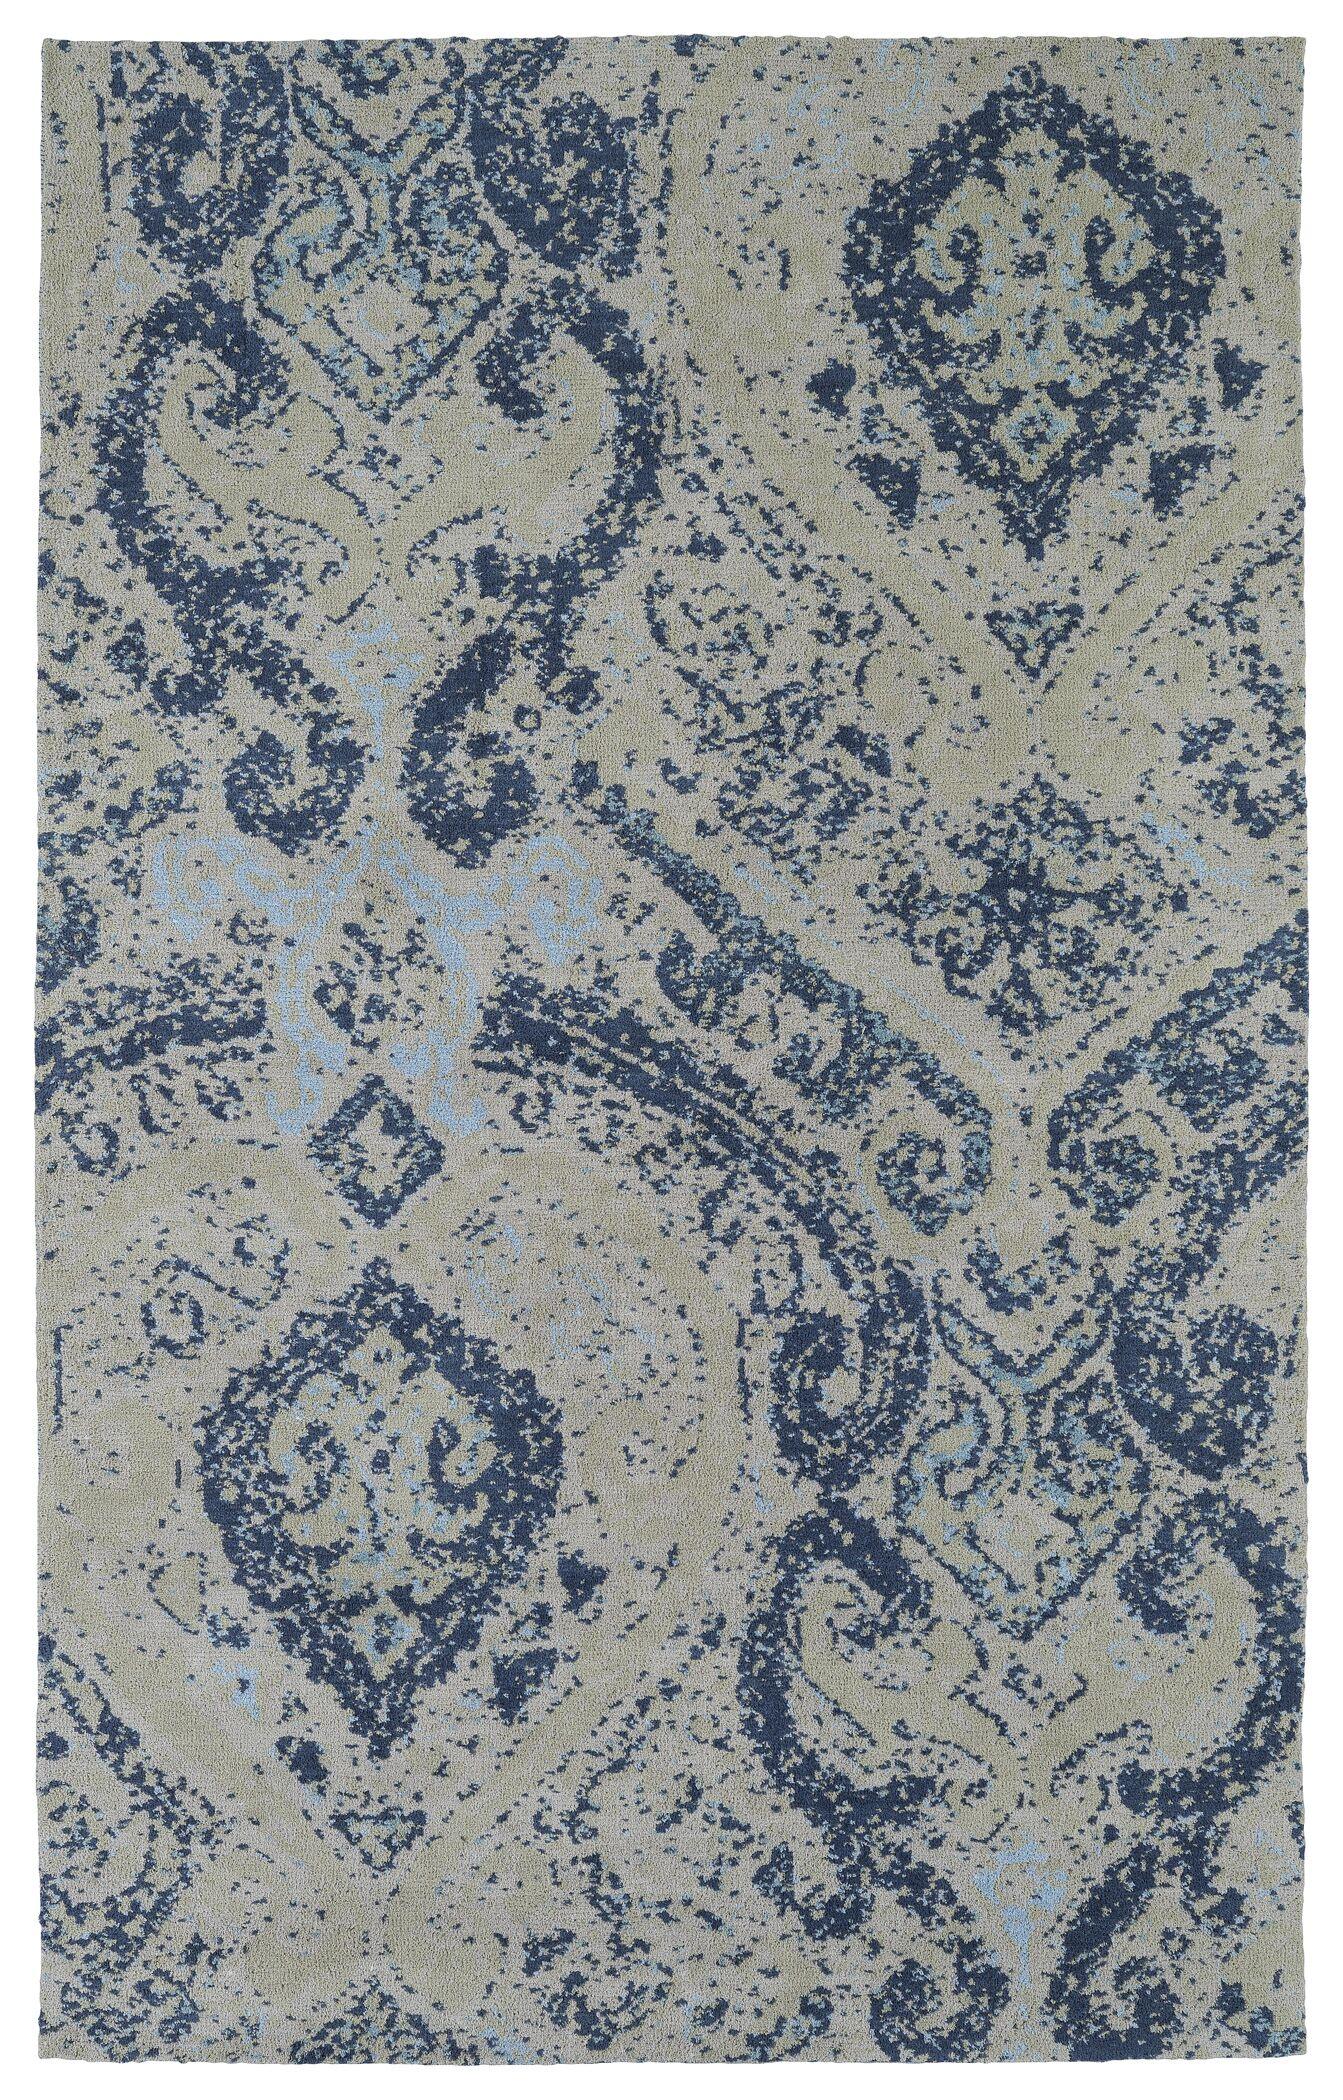 Coffman Blue Area Rug Rug Size: Rectangle 9' x 12'